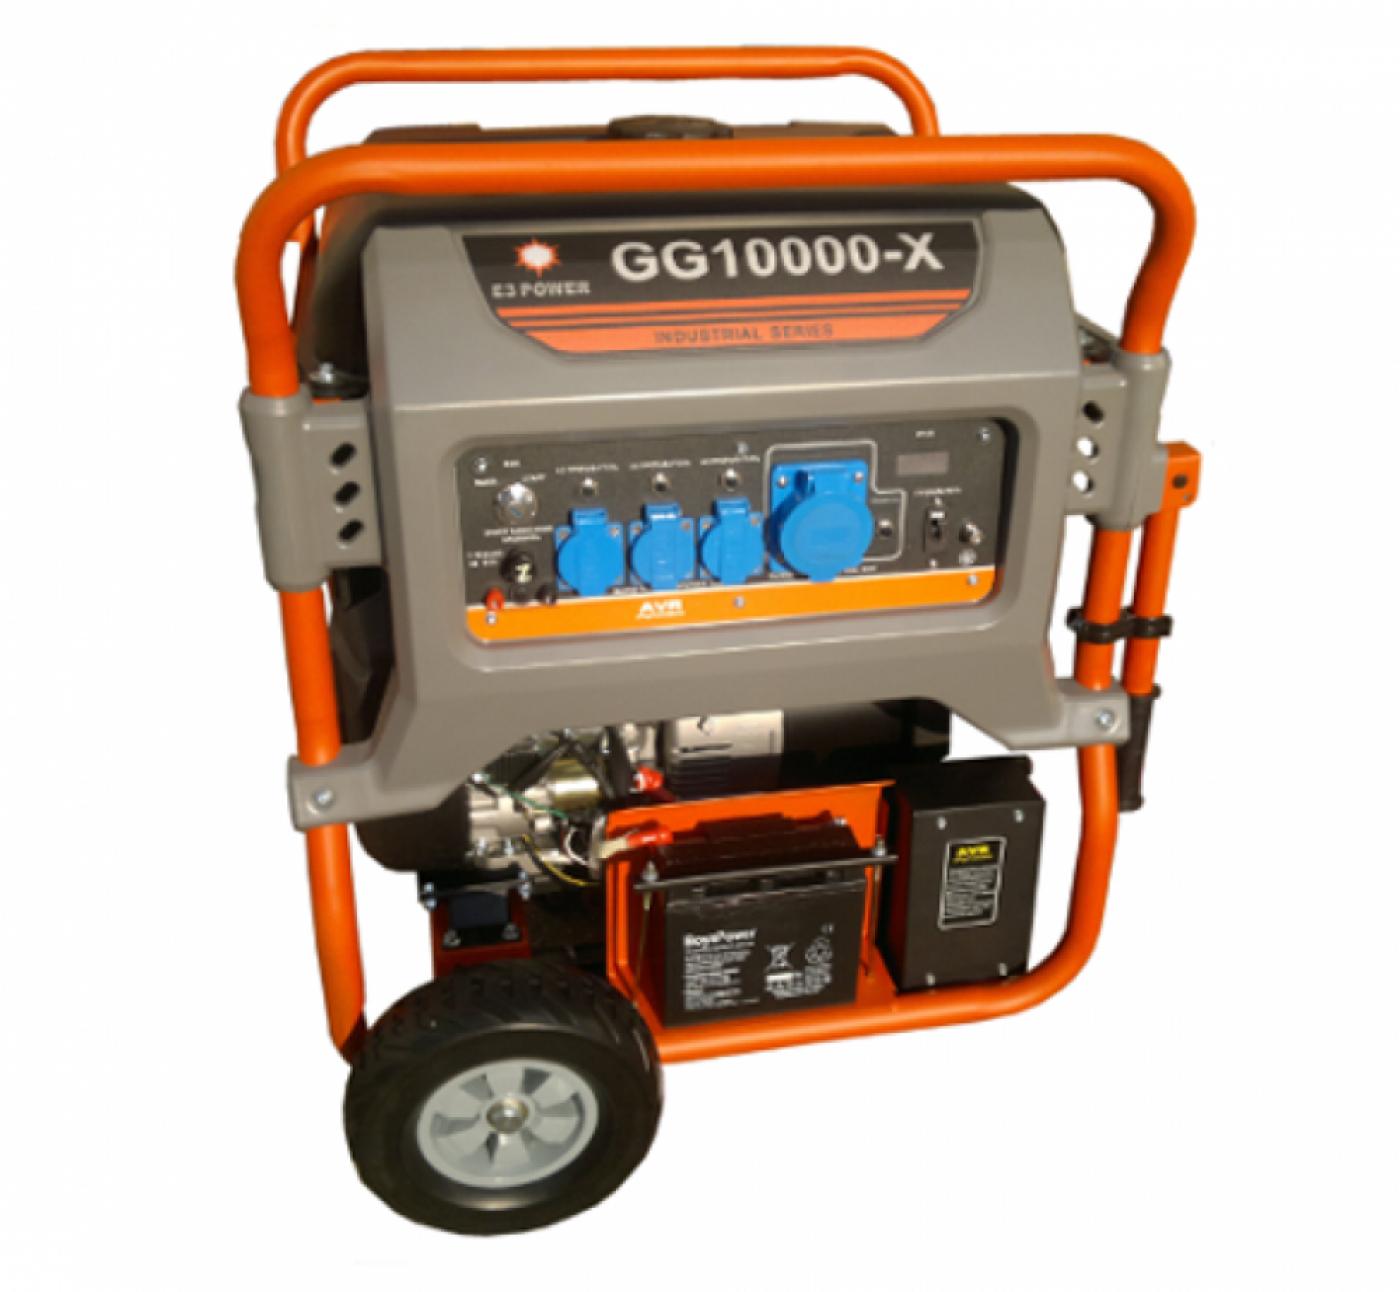 Газовый генератор Russian engineering group Gg10000-x